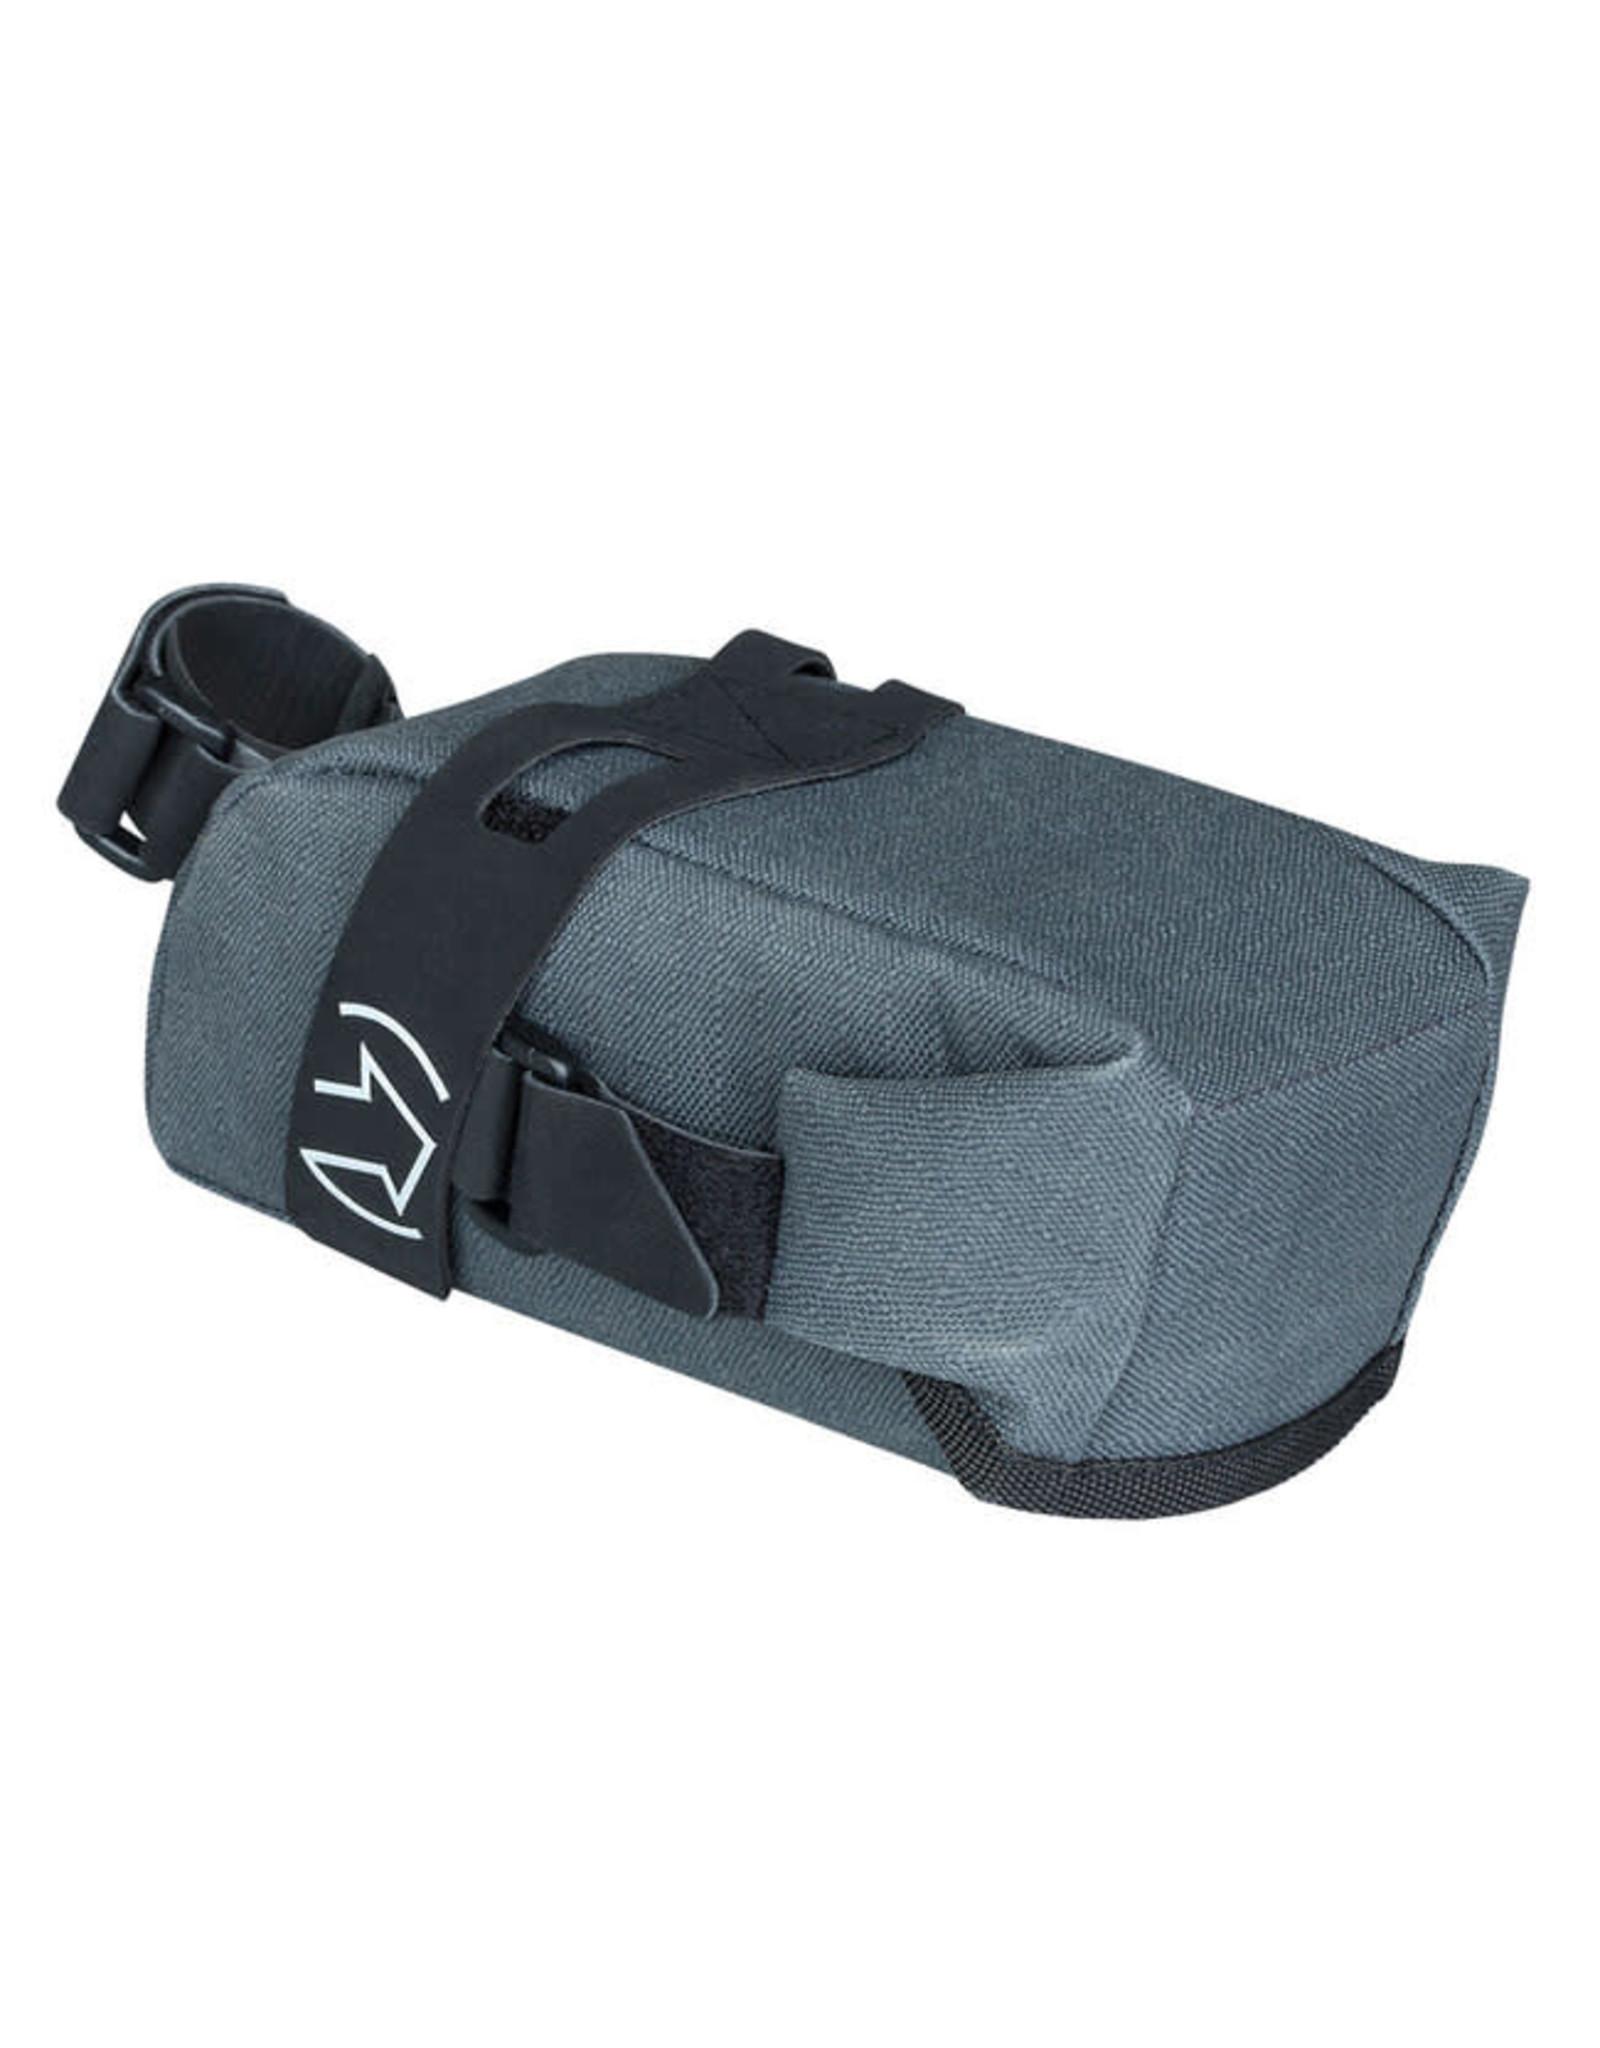 Shimano Shimano Discover Gravel Seatbag  .6L Gray